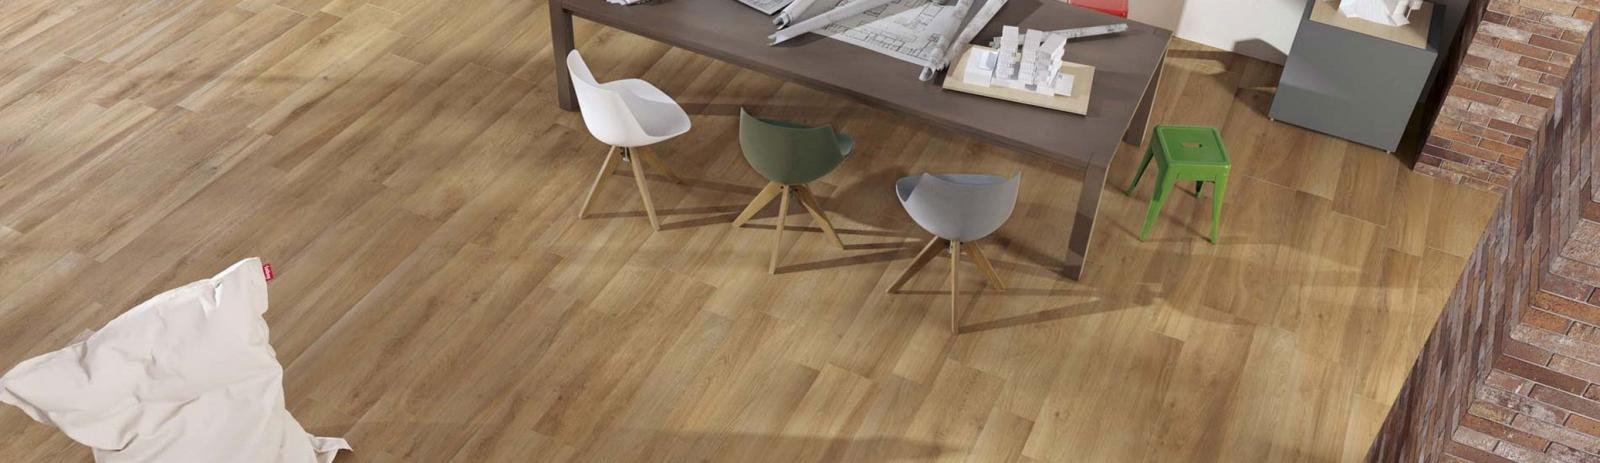 banner-ever-wood-look-floor-wall-tile-ceramic-rondine-1900x550